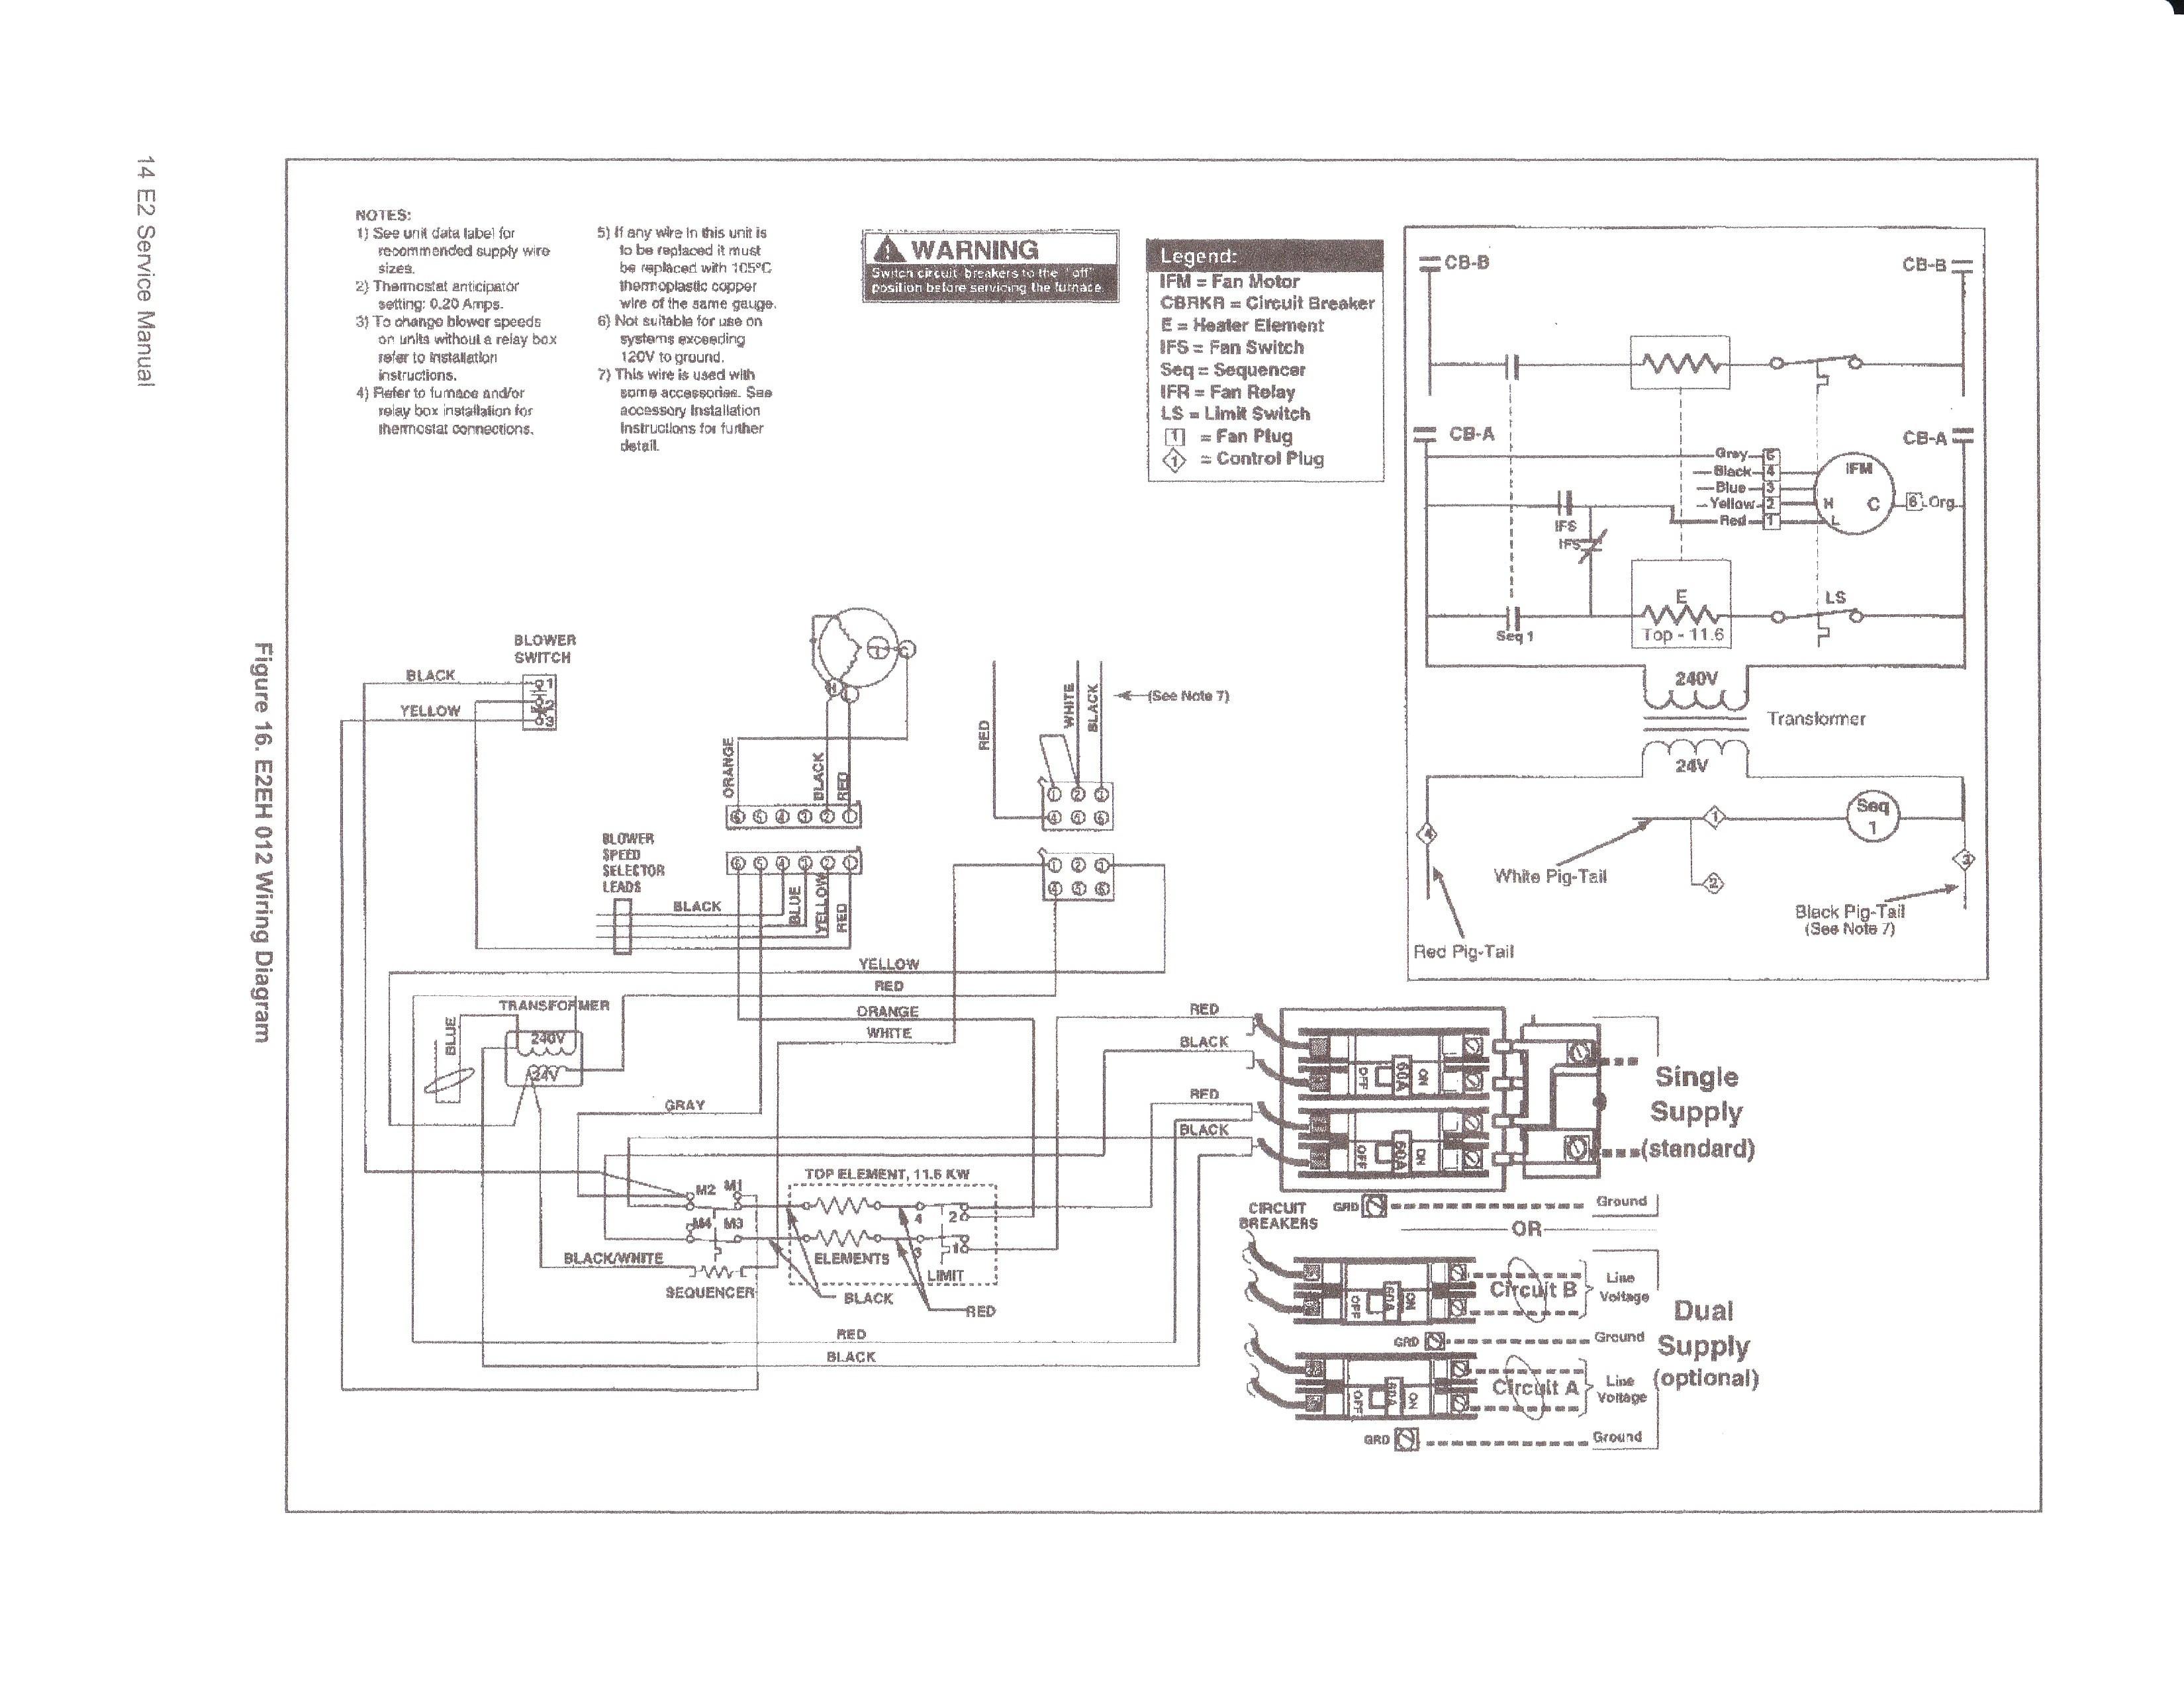 nordyne air handler wiring diagram free wiring diagram. Black Bedroom Furniture Sets. Home Design Ideas